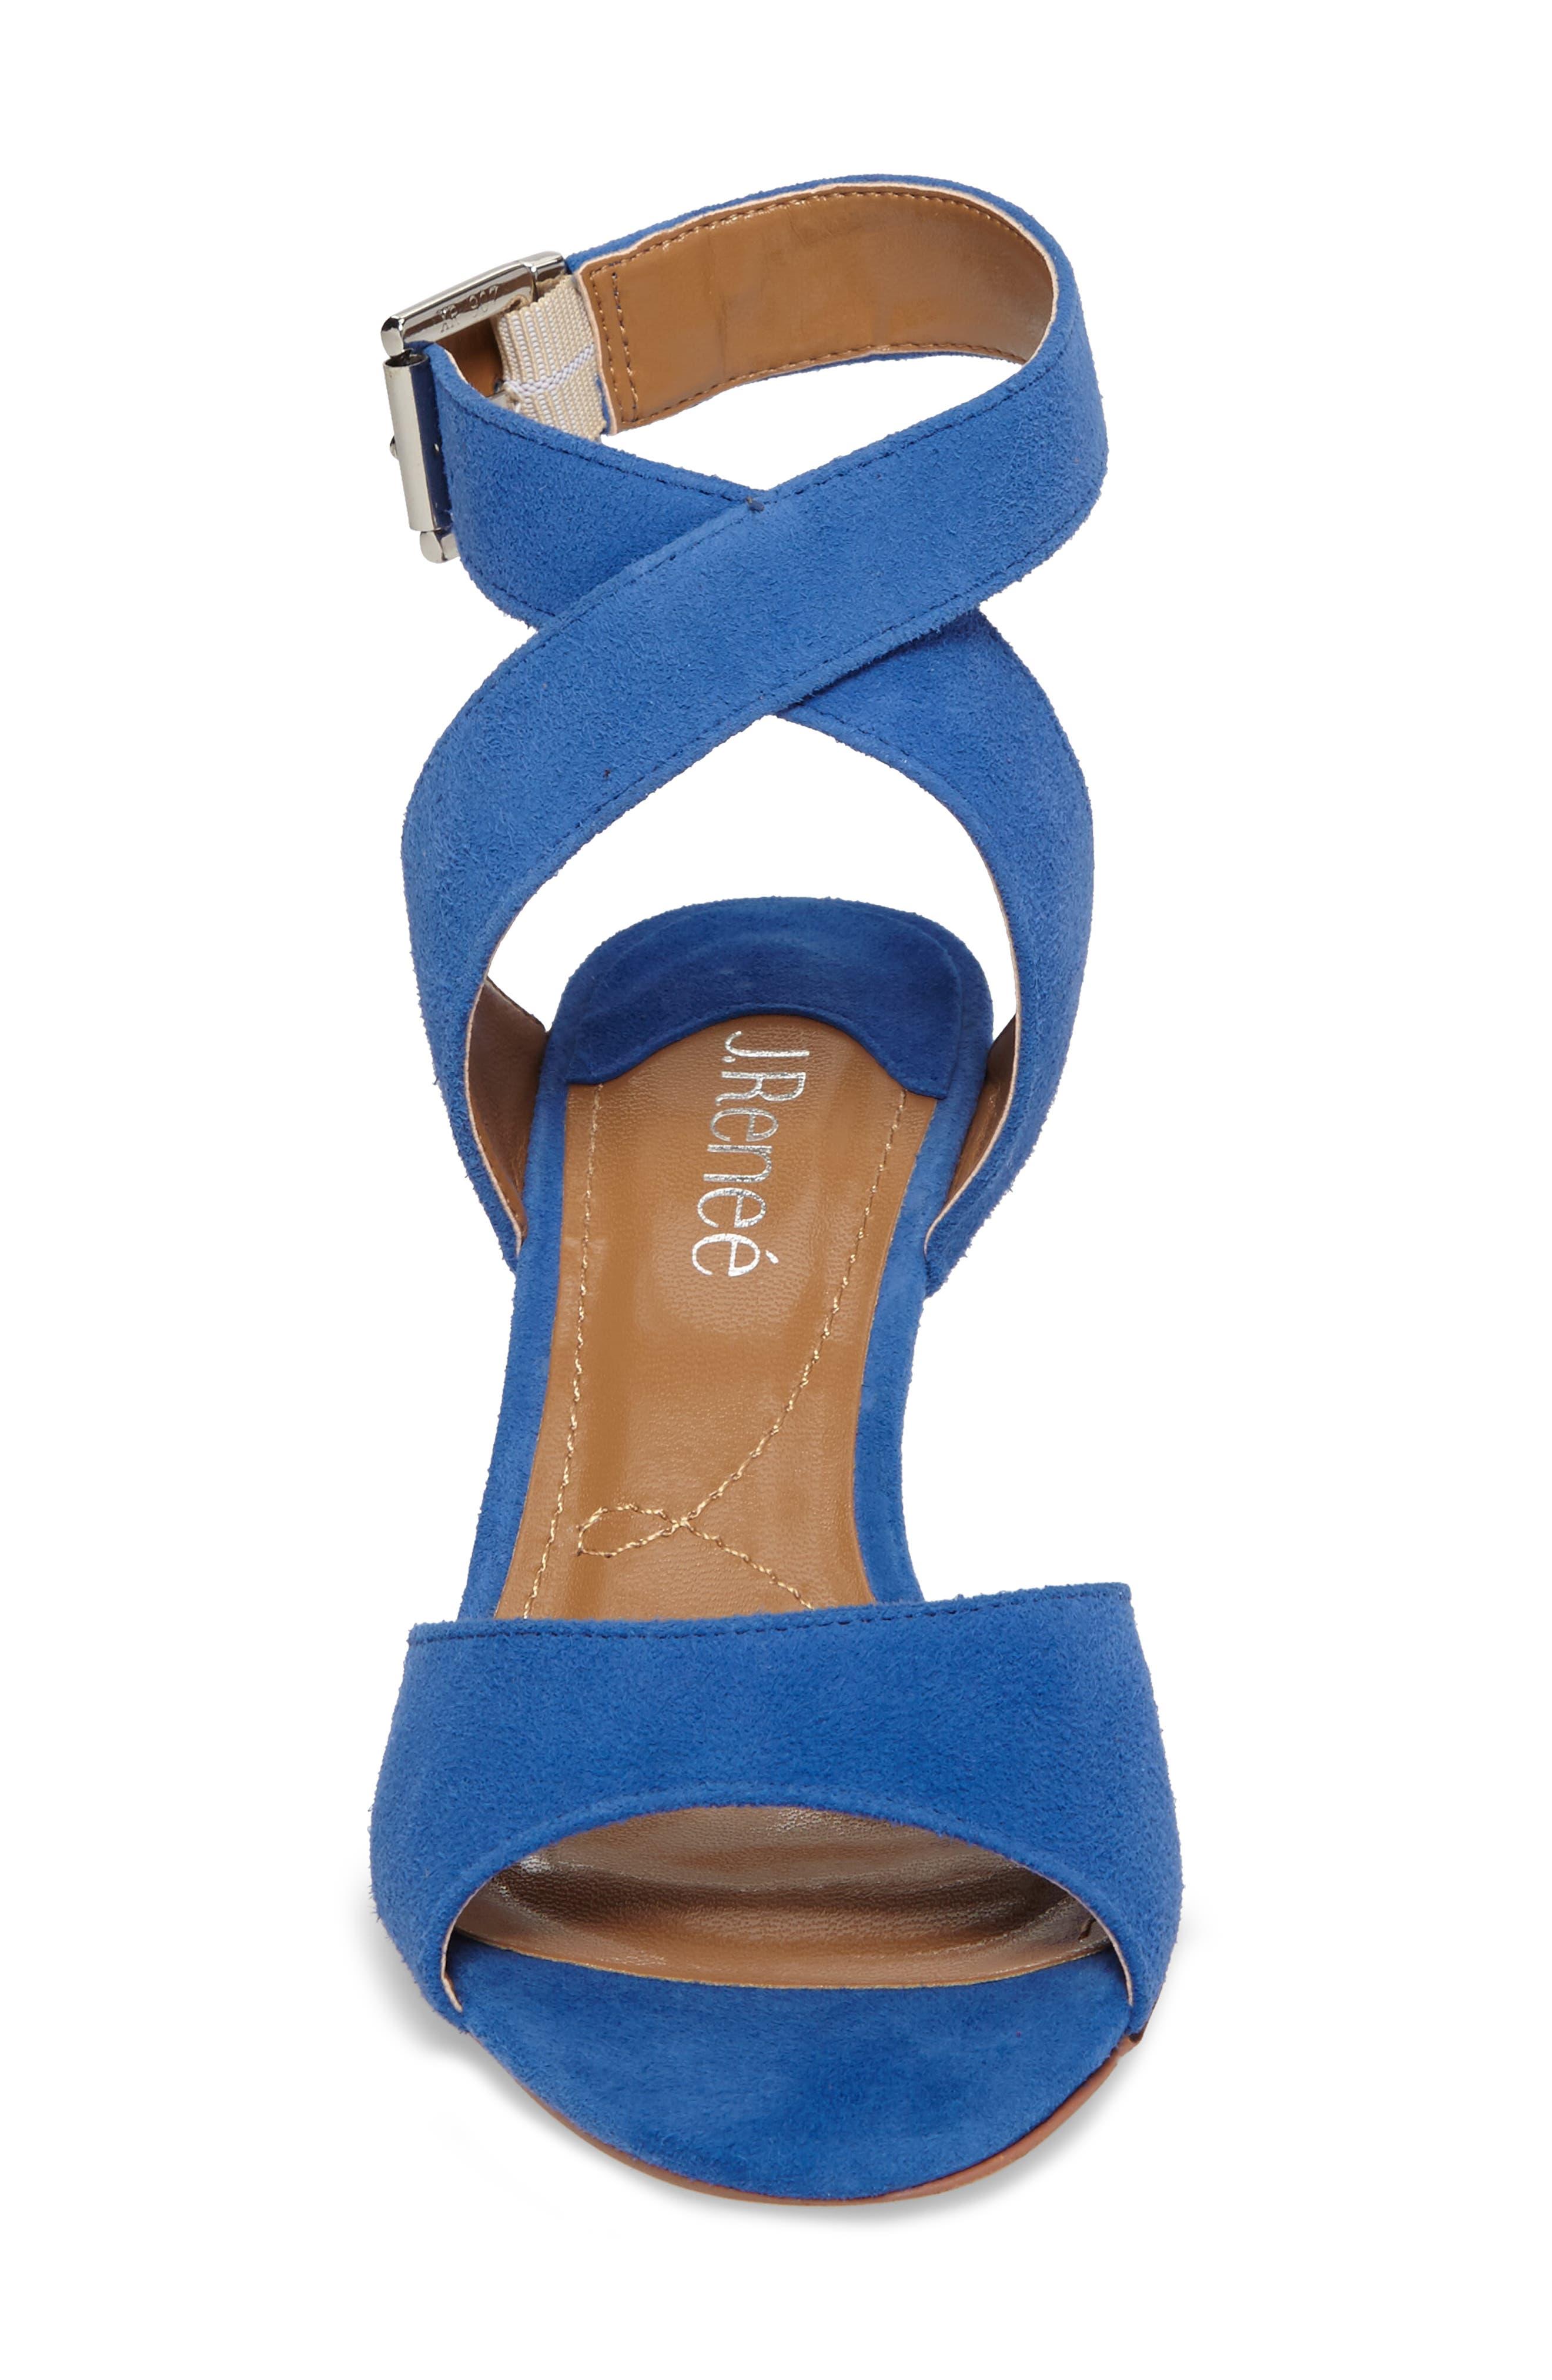 J. RENEÉ, 'Soncino' Ankle Strap Sandal, Alternate thumbnail 4, color, BLUE FABRIC